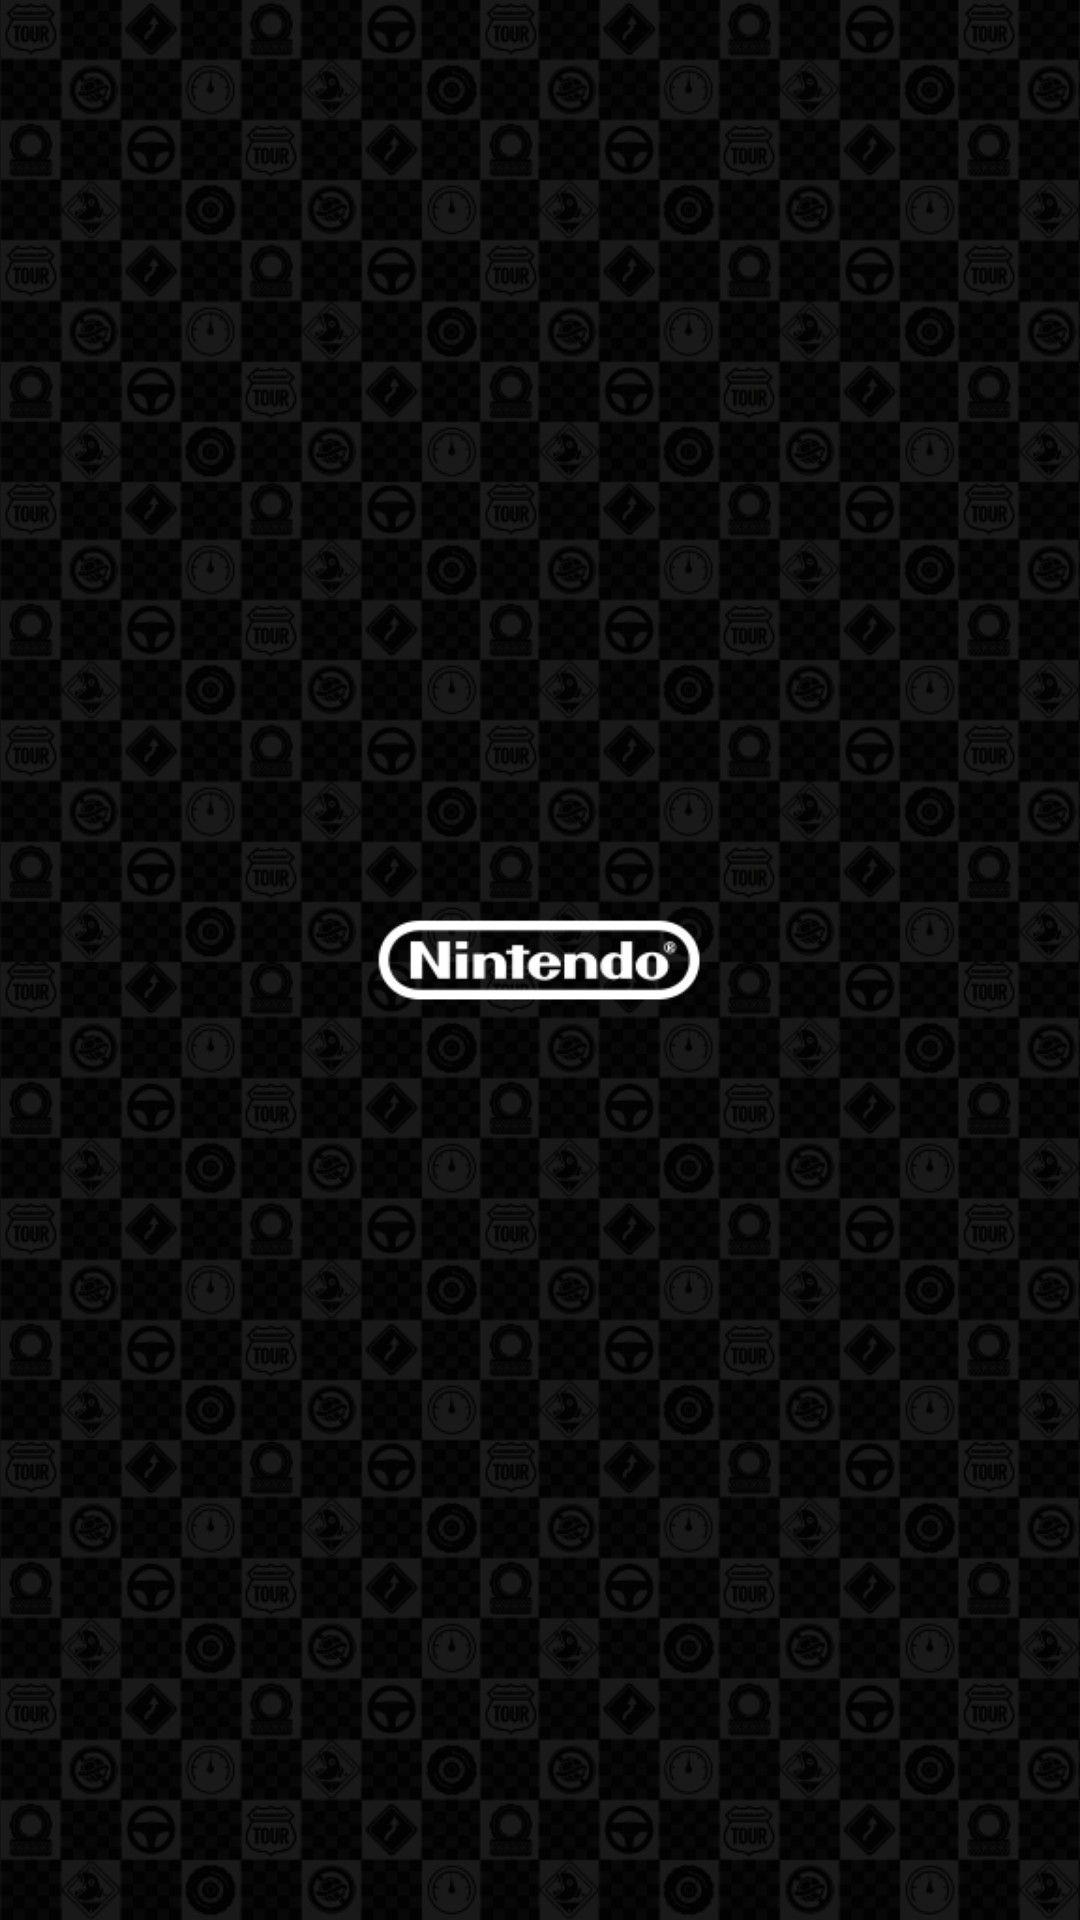 Pin By Ale Aiba On Keine Ahnung Was Hier Gepinnt Ist Aber Egal Nintendo Logo Logos Vehicle Logos